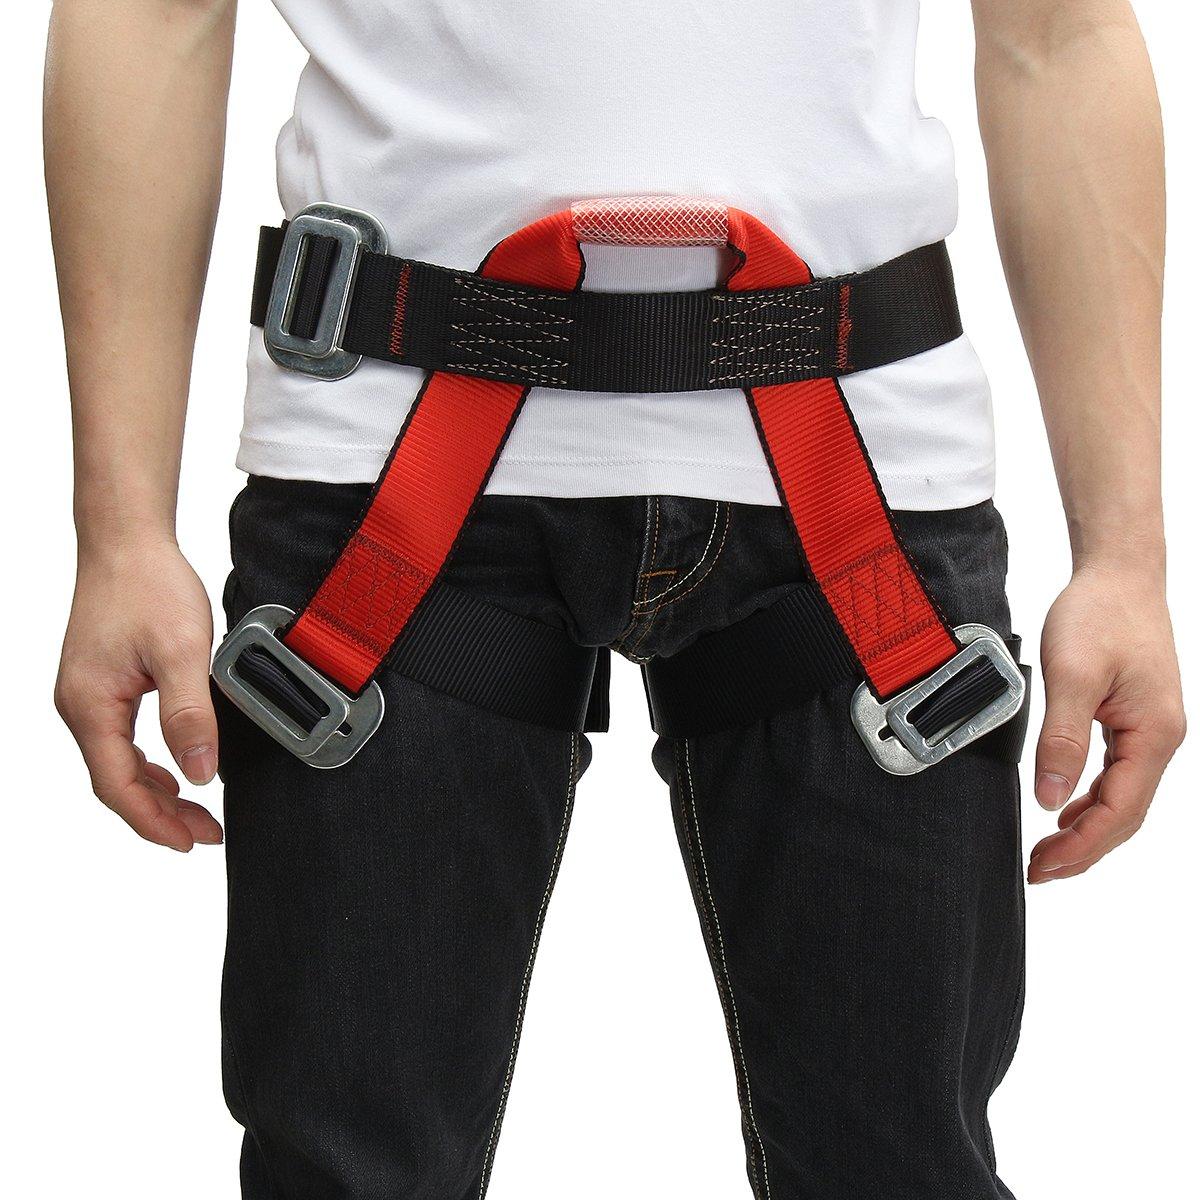 QOJA outdoor mountain rock climbing rappelling harness bust belt by QOJA (Image #2)